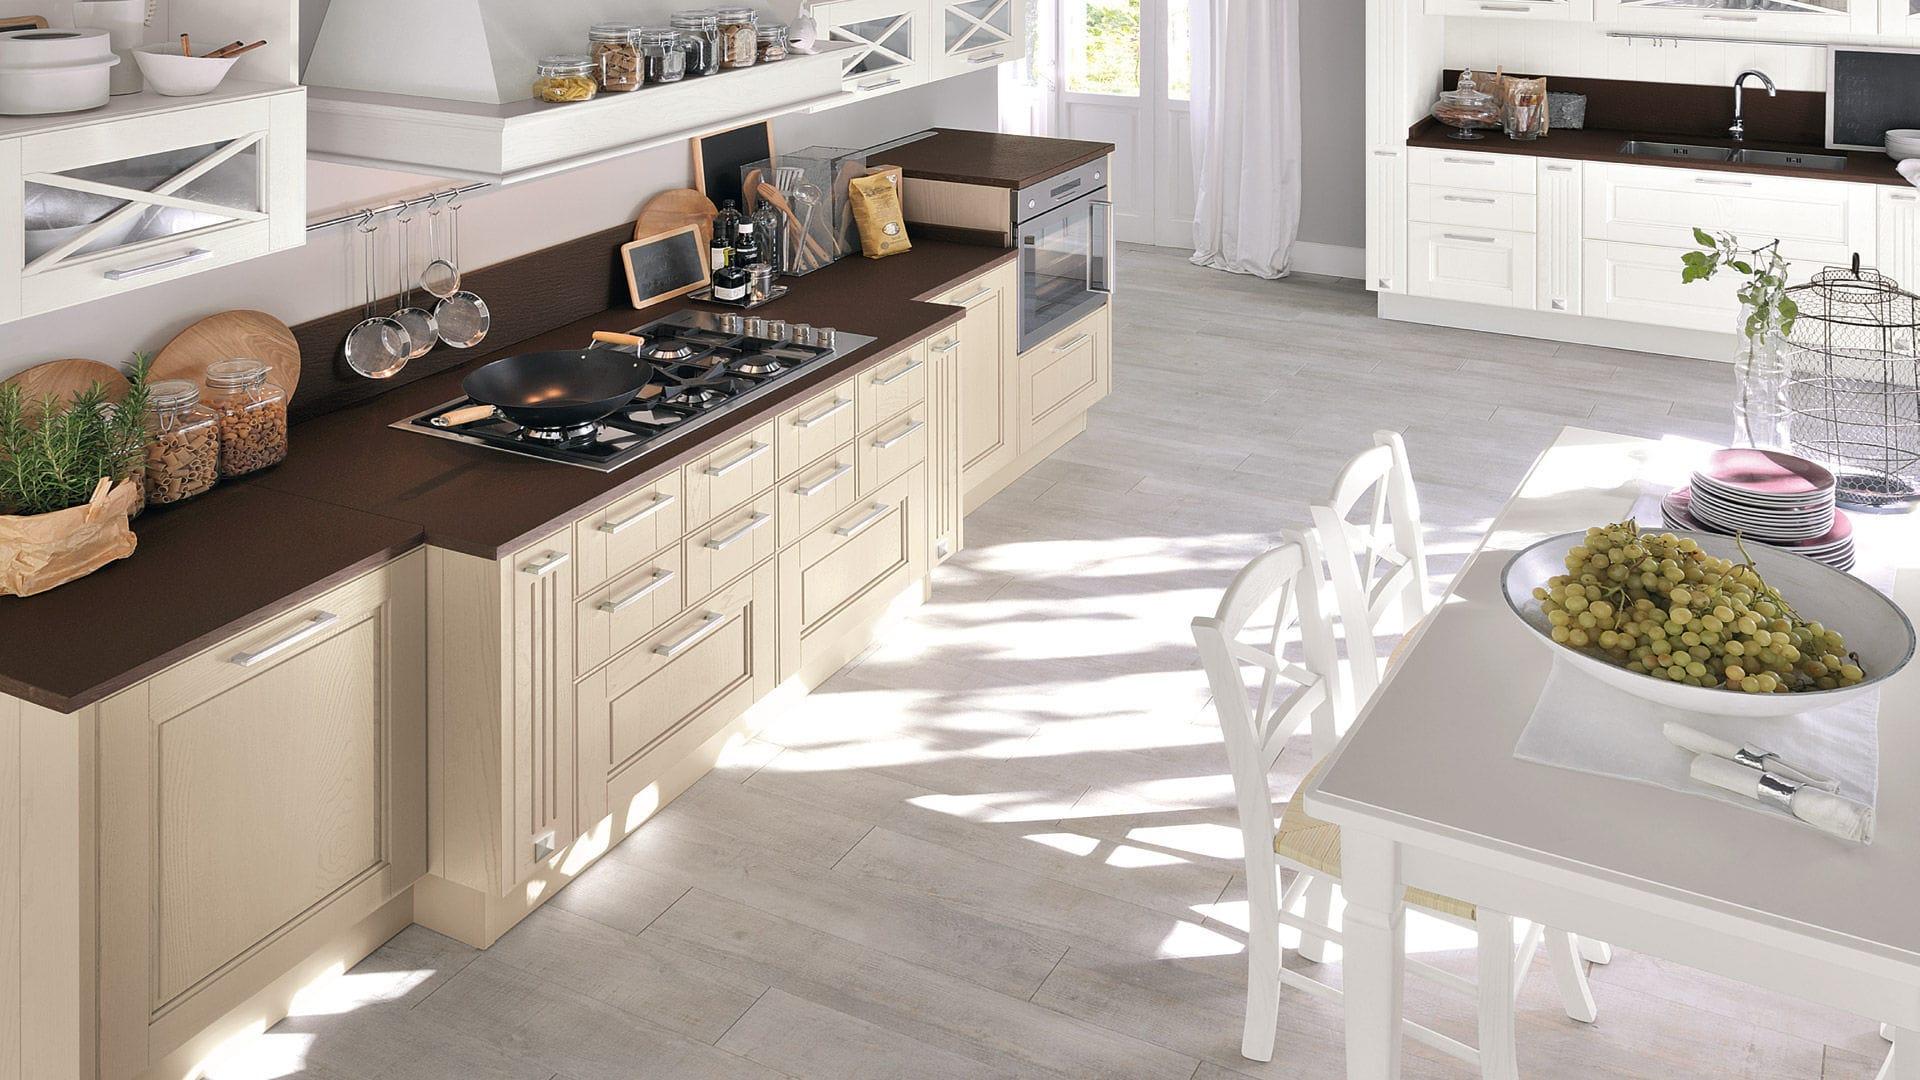 Cucina classica / in legno / con impugnature - AGNESE - CUCINE LUBE ...